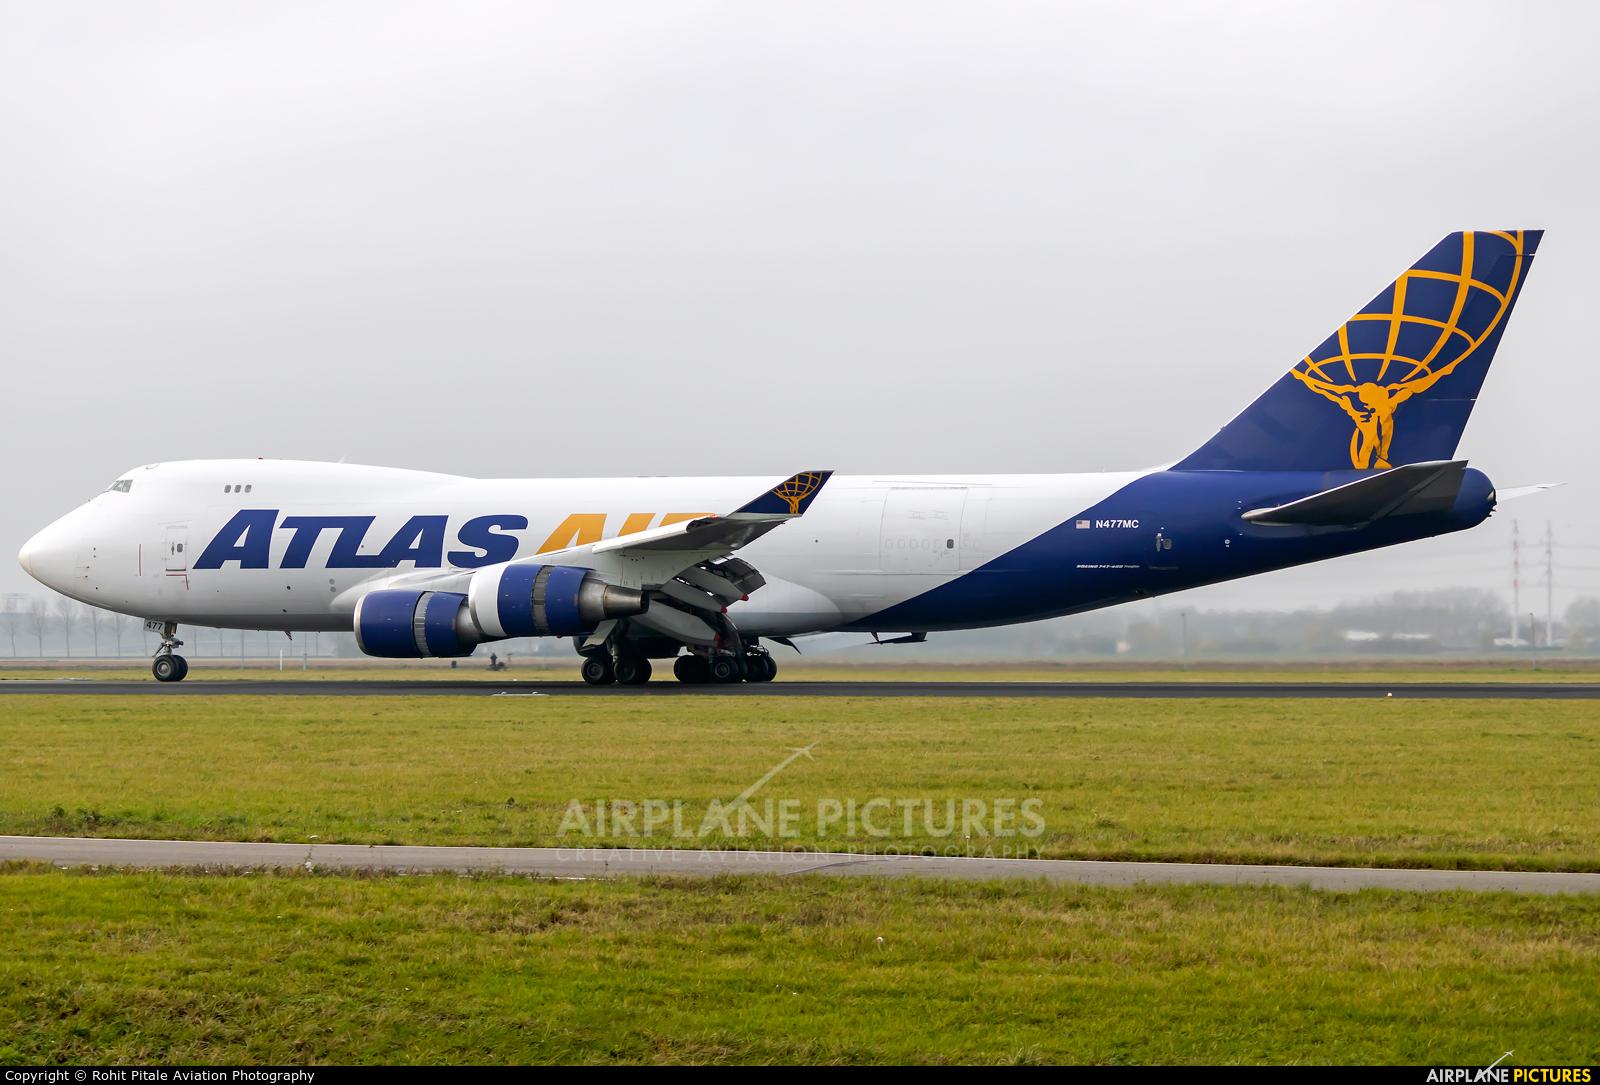 Atlas Air N477MC aircraft at Amsterdam - Schiphol